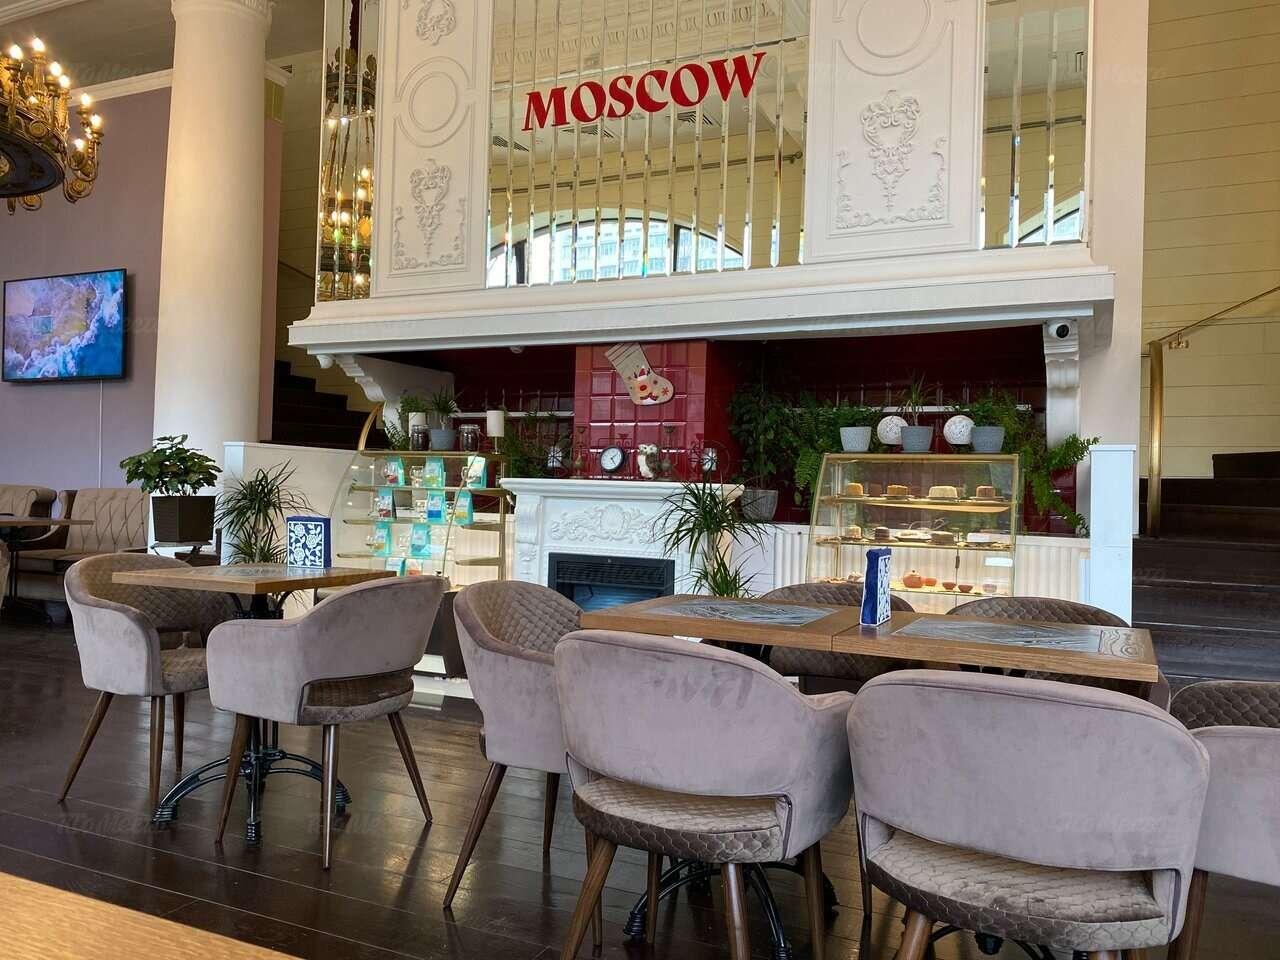 Кафе Moscow (Москва) на Садово-Триумфальной фото 13